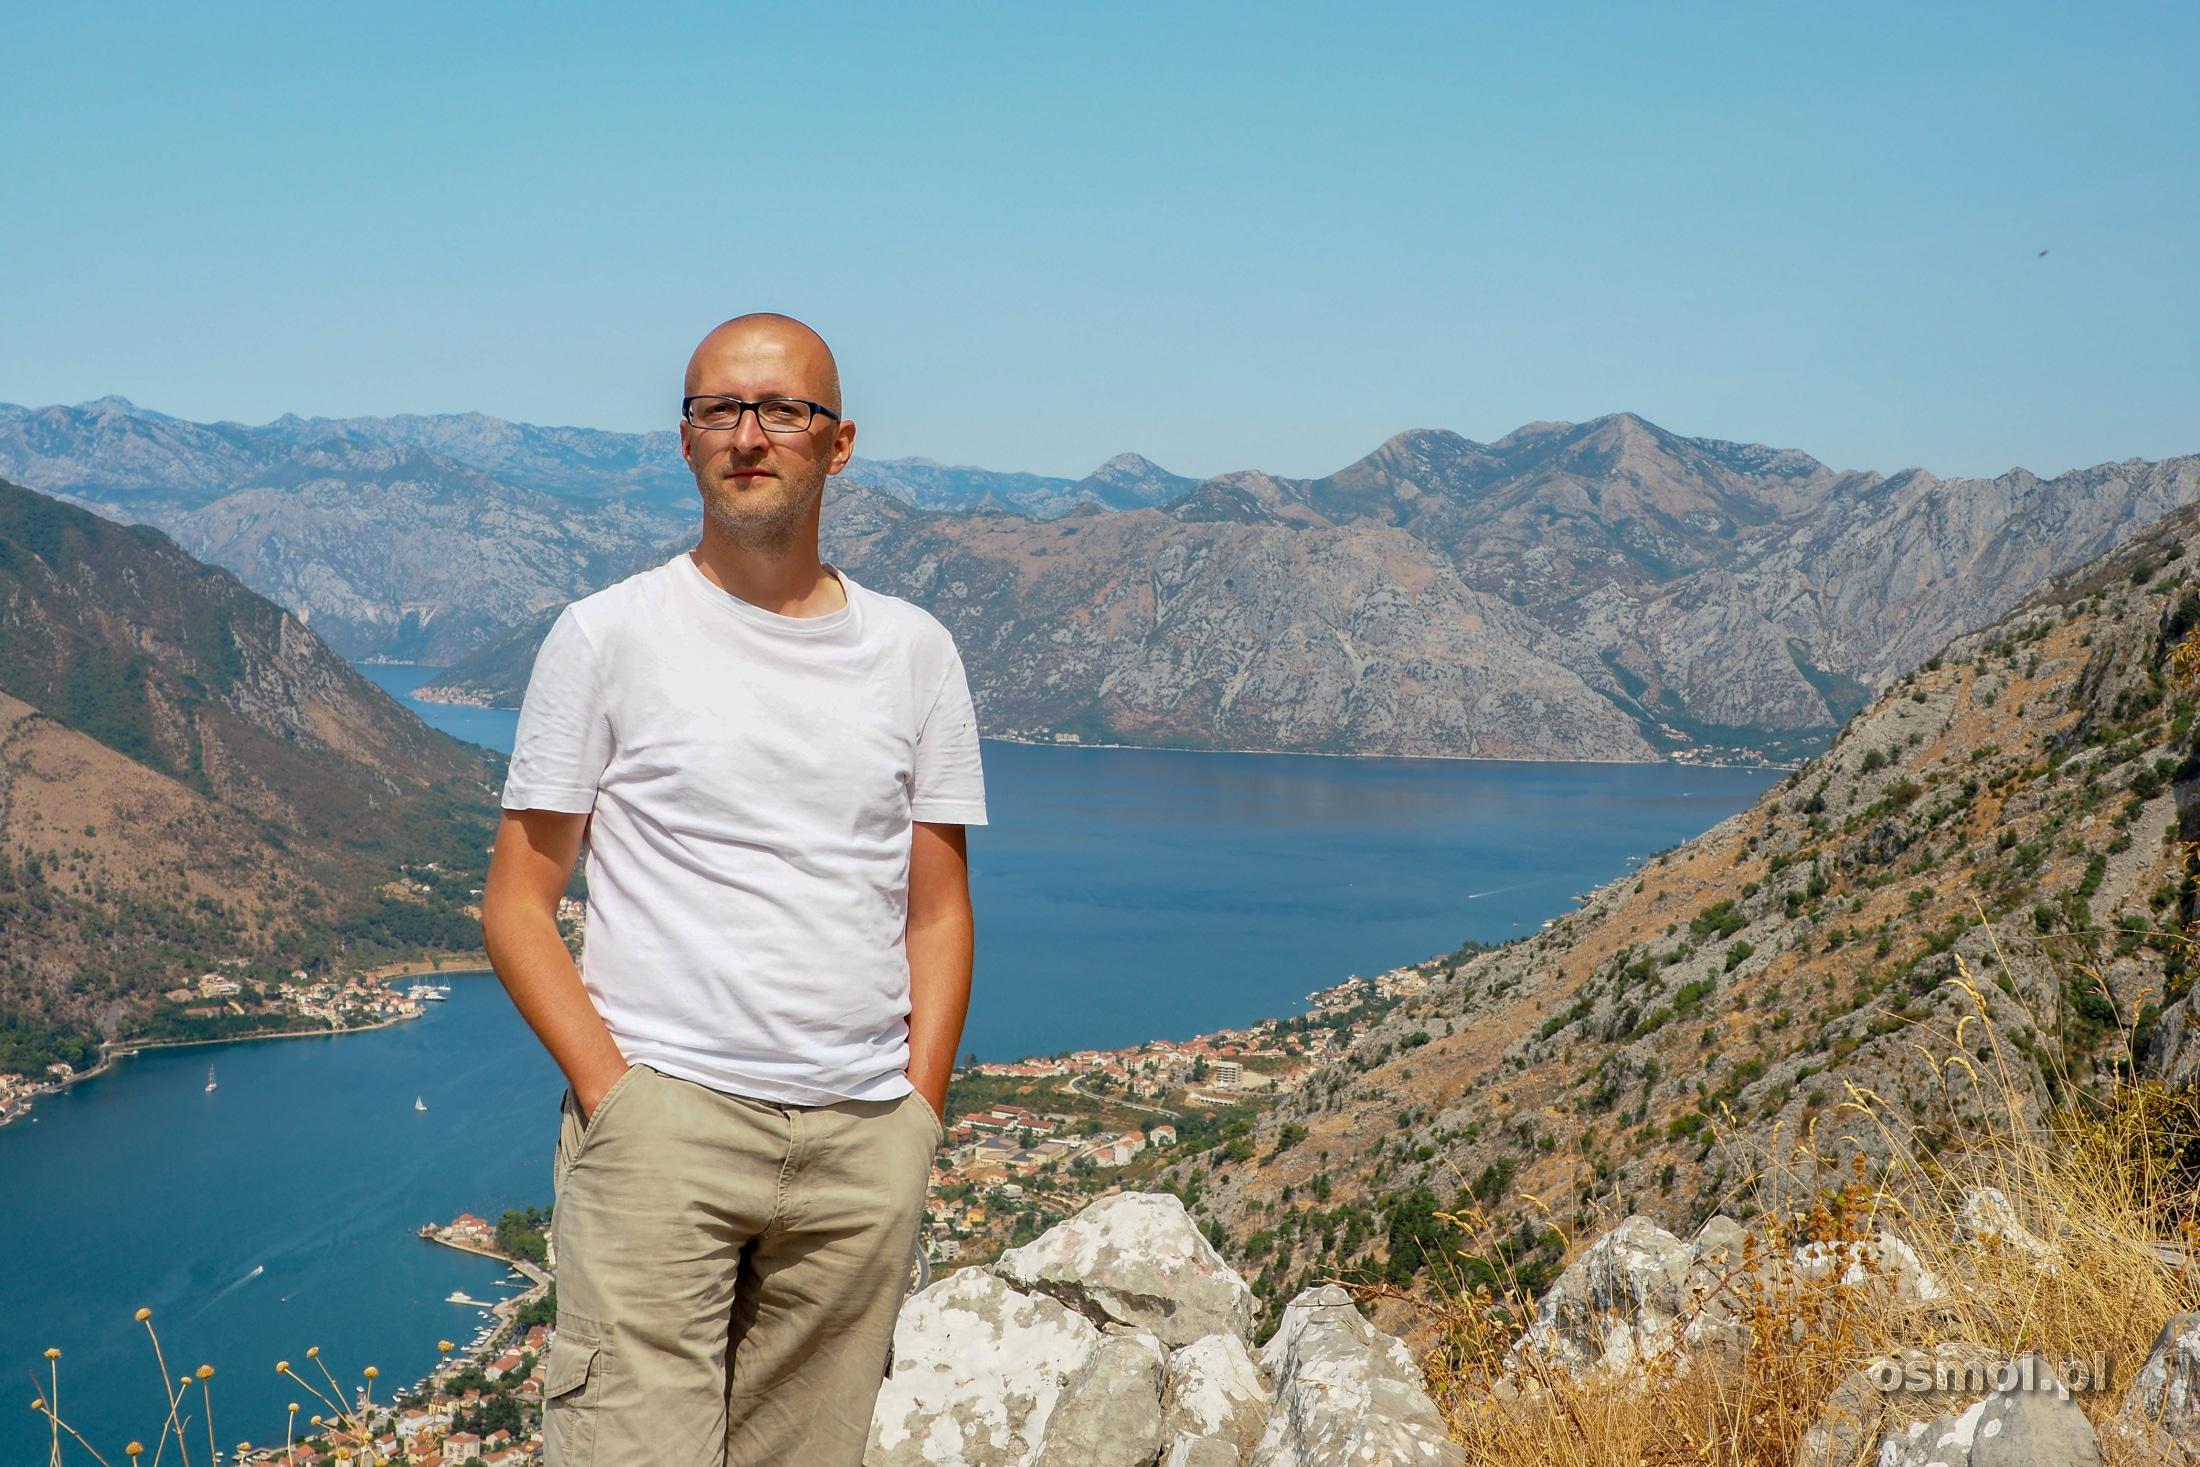 Widok na Kotor z góry nad miastem